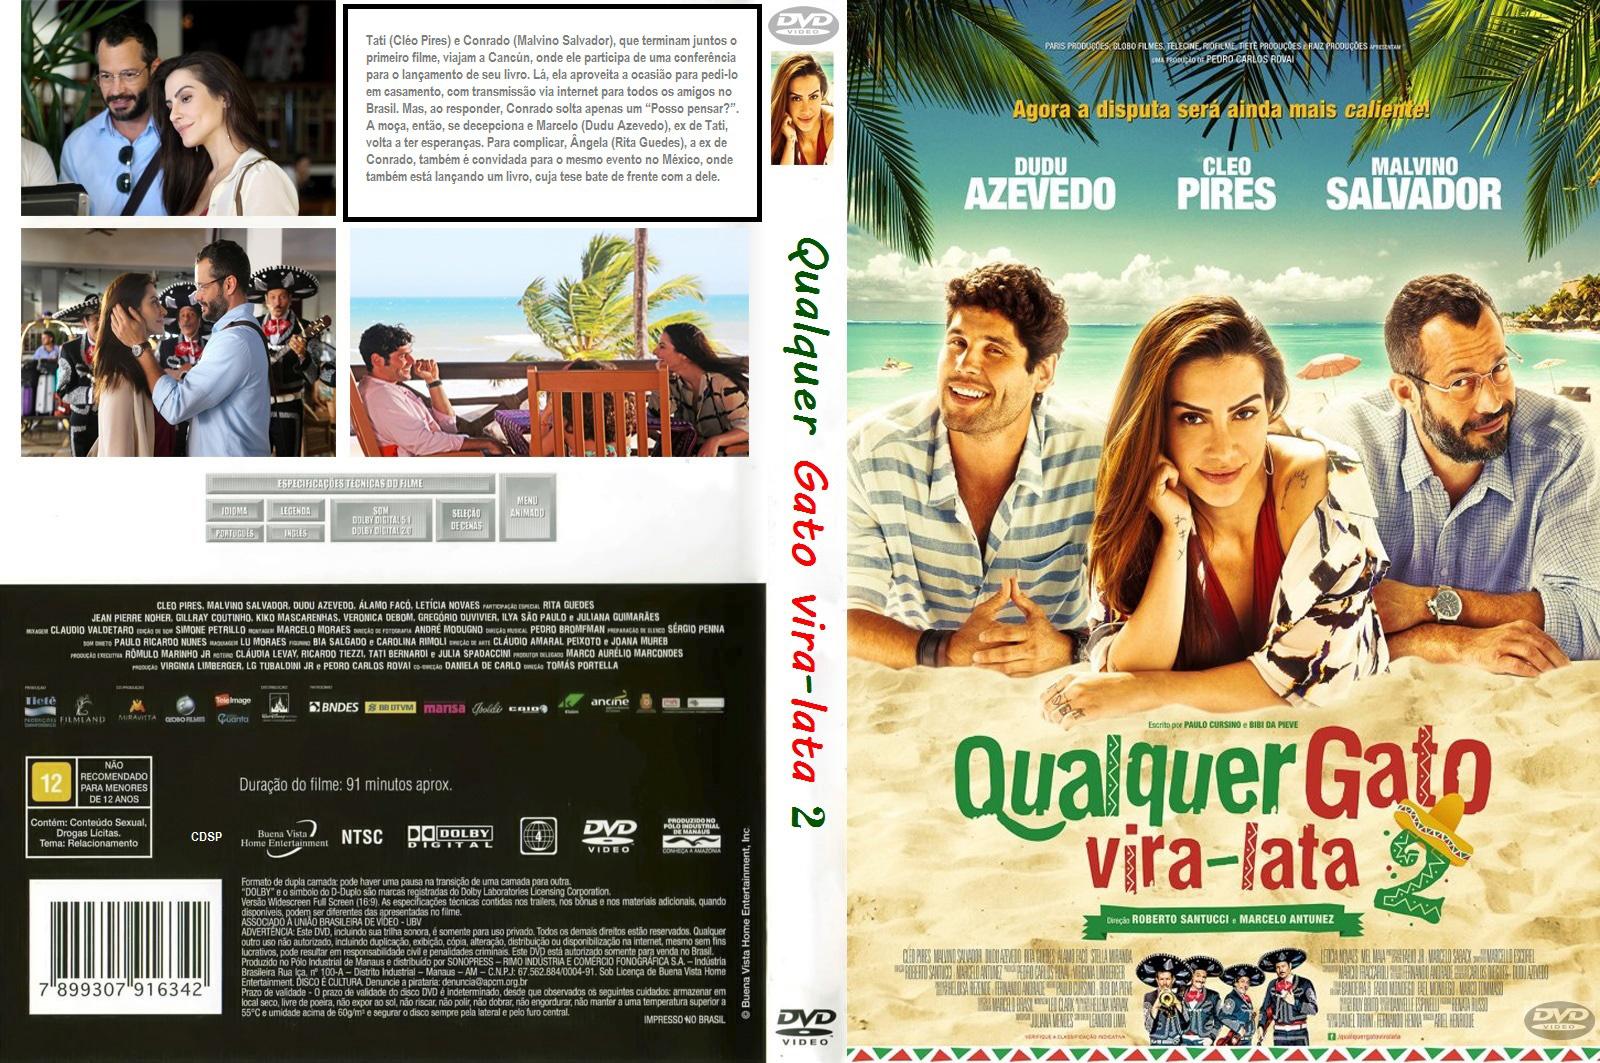 Download Qualquer Gato Vira-Lata 2 DVDRip XviD Nacional QUALQUER GATO VIRA LATA 2